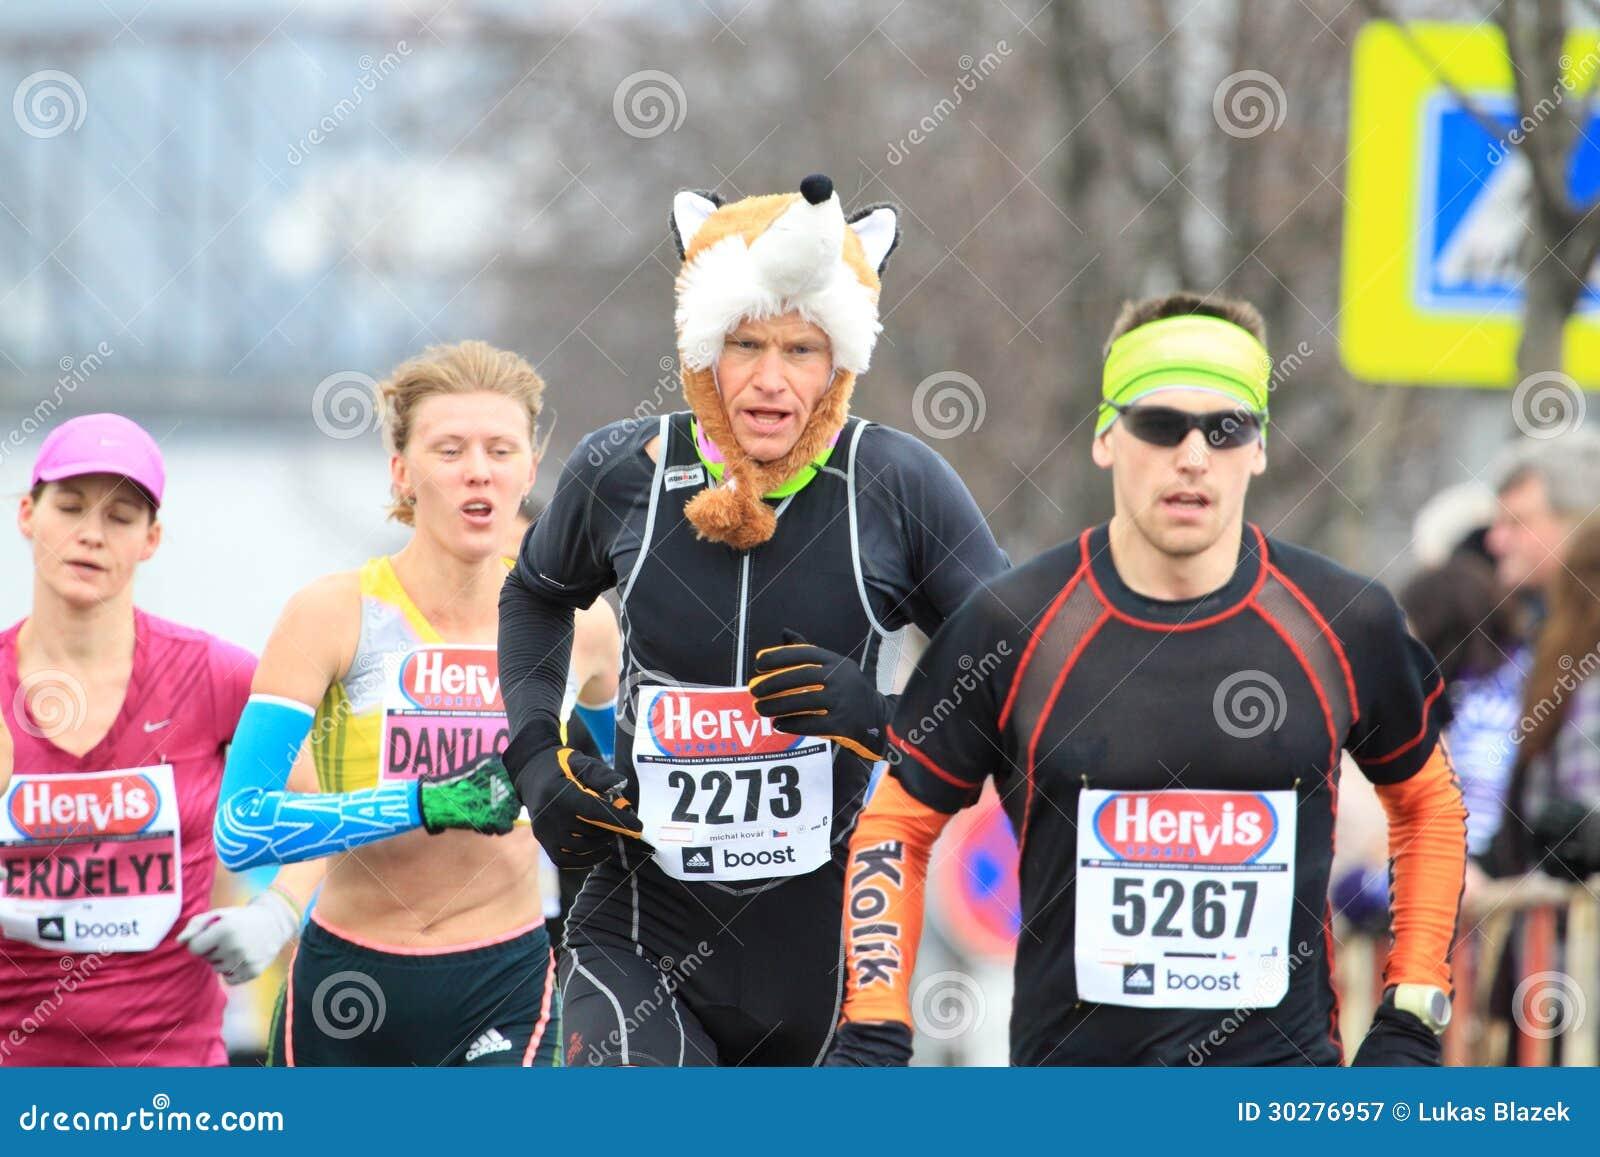 Hervis半布拉格马拉松2013年